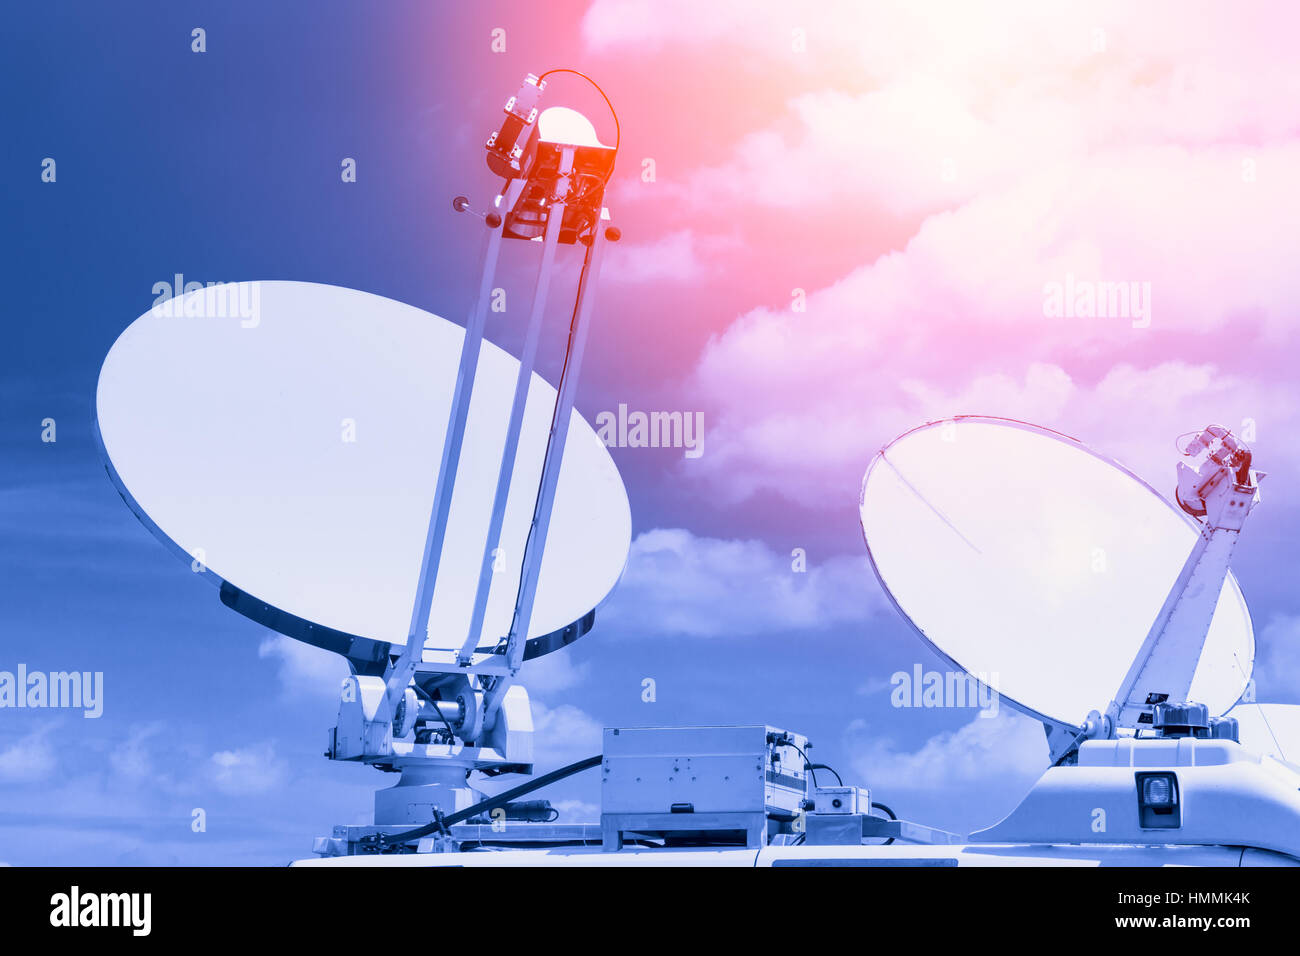 13ef2cffe85f Satellite Dish Stock Photos   Satellite Dish Stock Images - Alamy